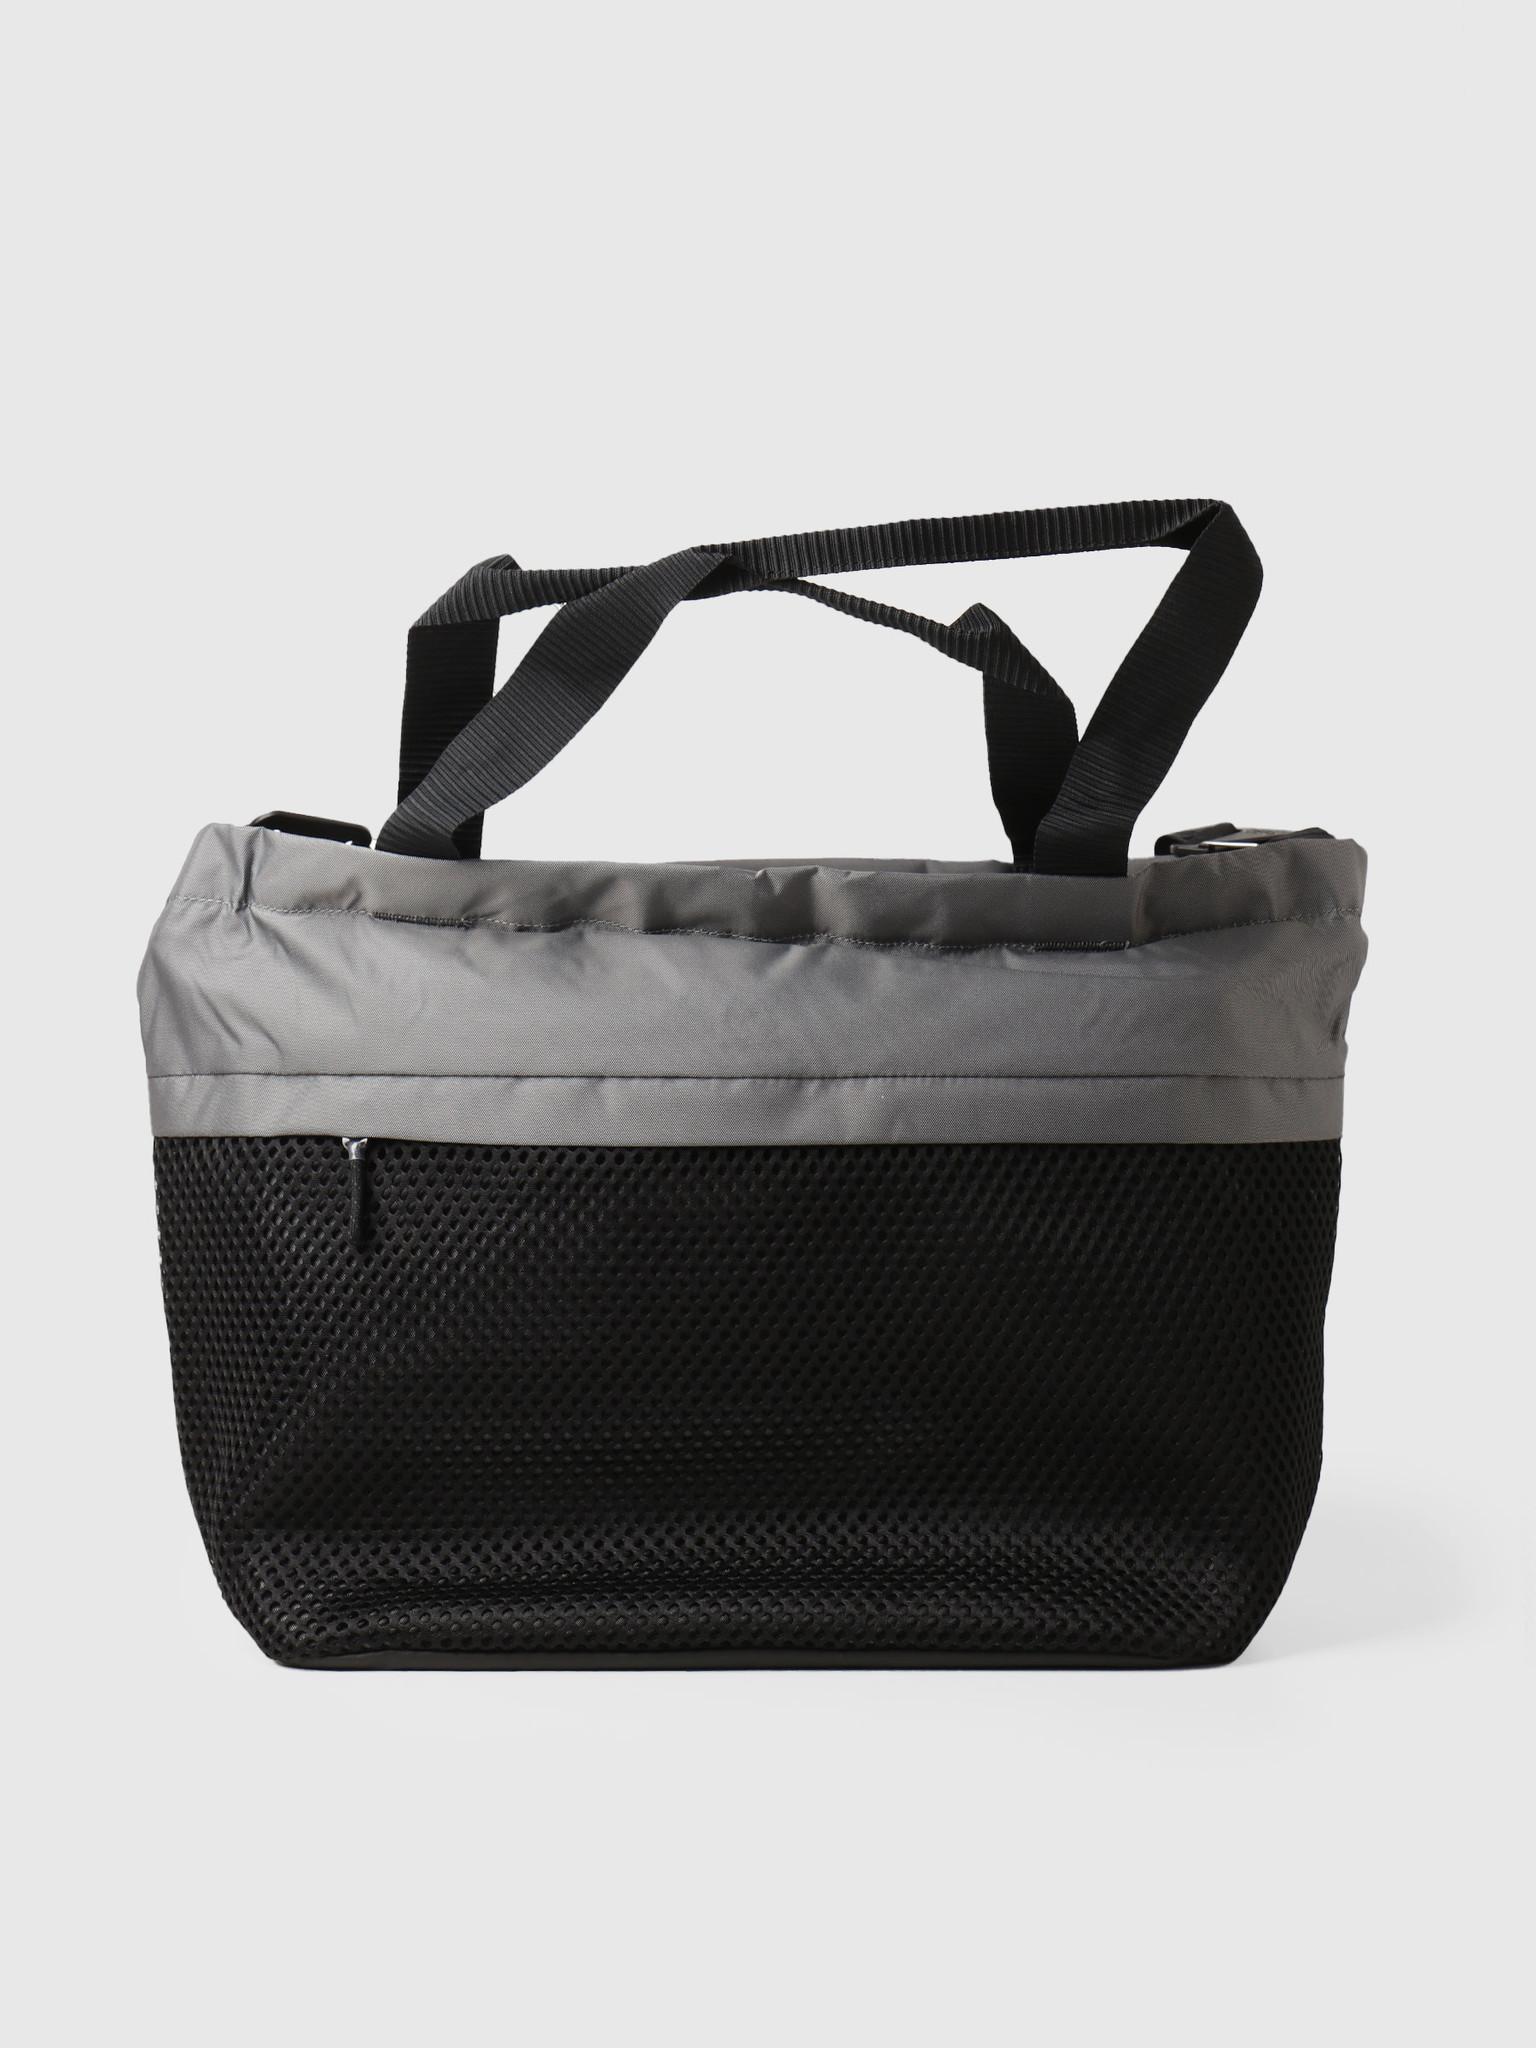 Nike Nike Nk Sprtswr Essentials Tote-Mtr Canyon Grey Canyon Grey White CV1056-010